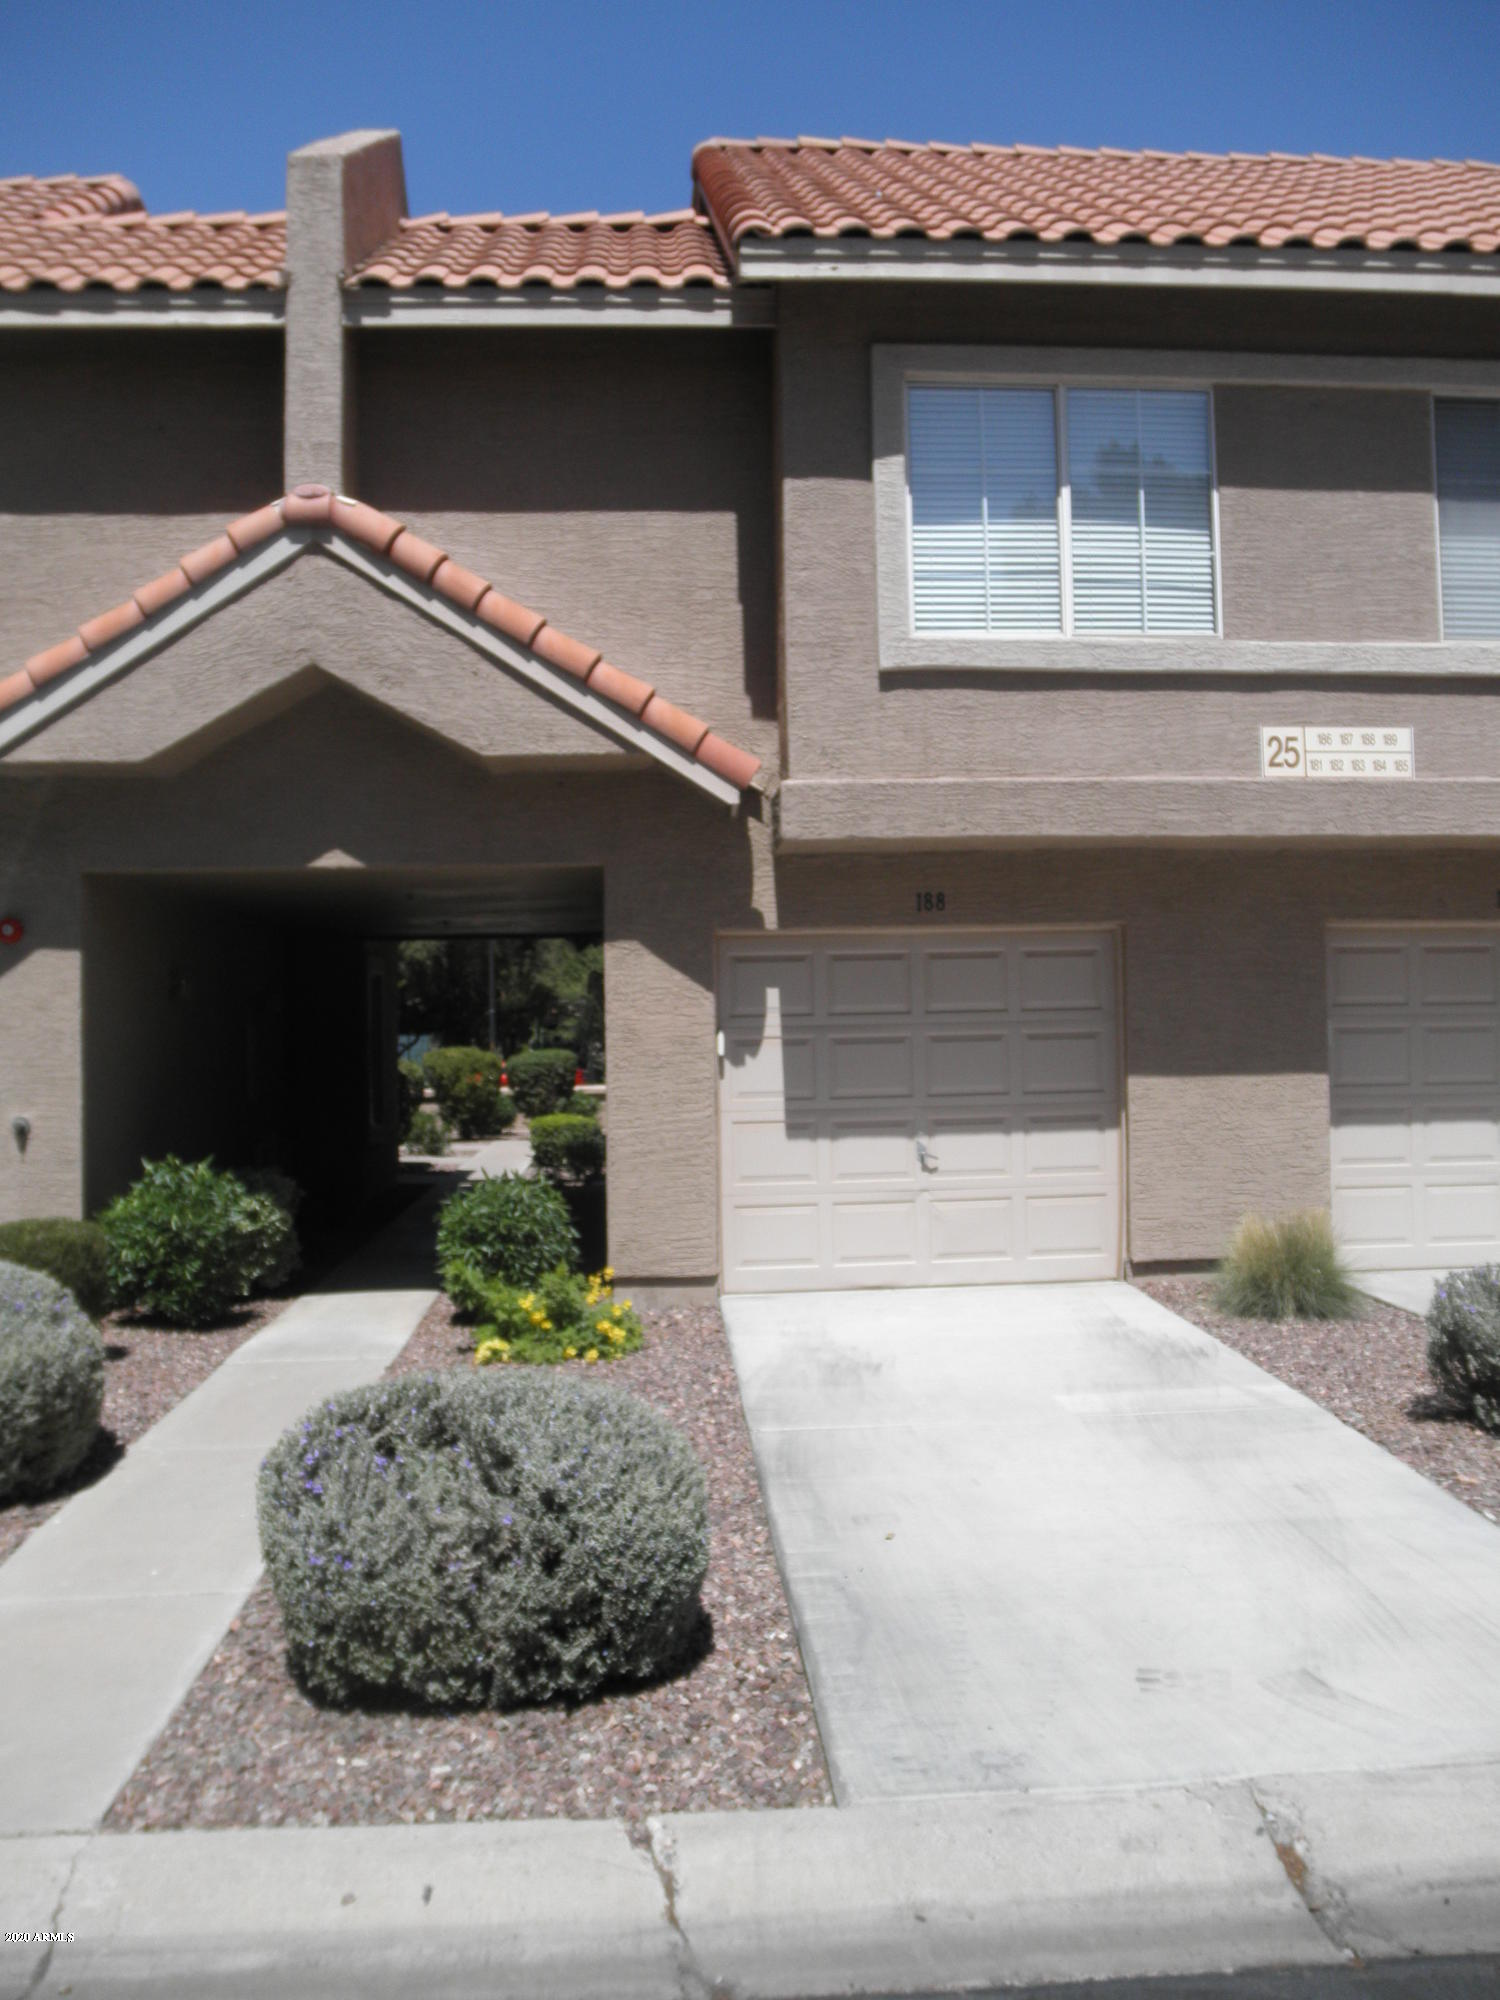 1633 E LAKESIDE Drive # 188, Gilbert, AZ 85234, 2 Bedrooms Bedrooms, ,Residential Lease,For Rent,1633 E LAKESIDE Drive # 188,6047947